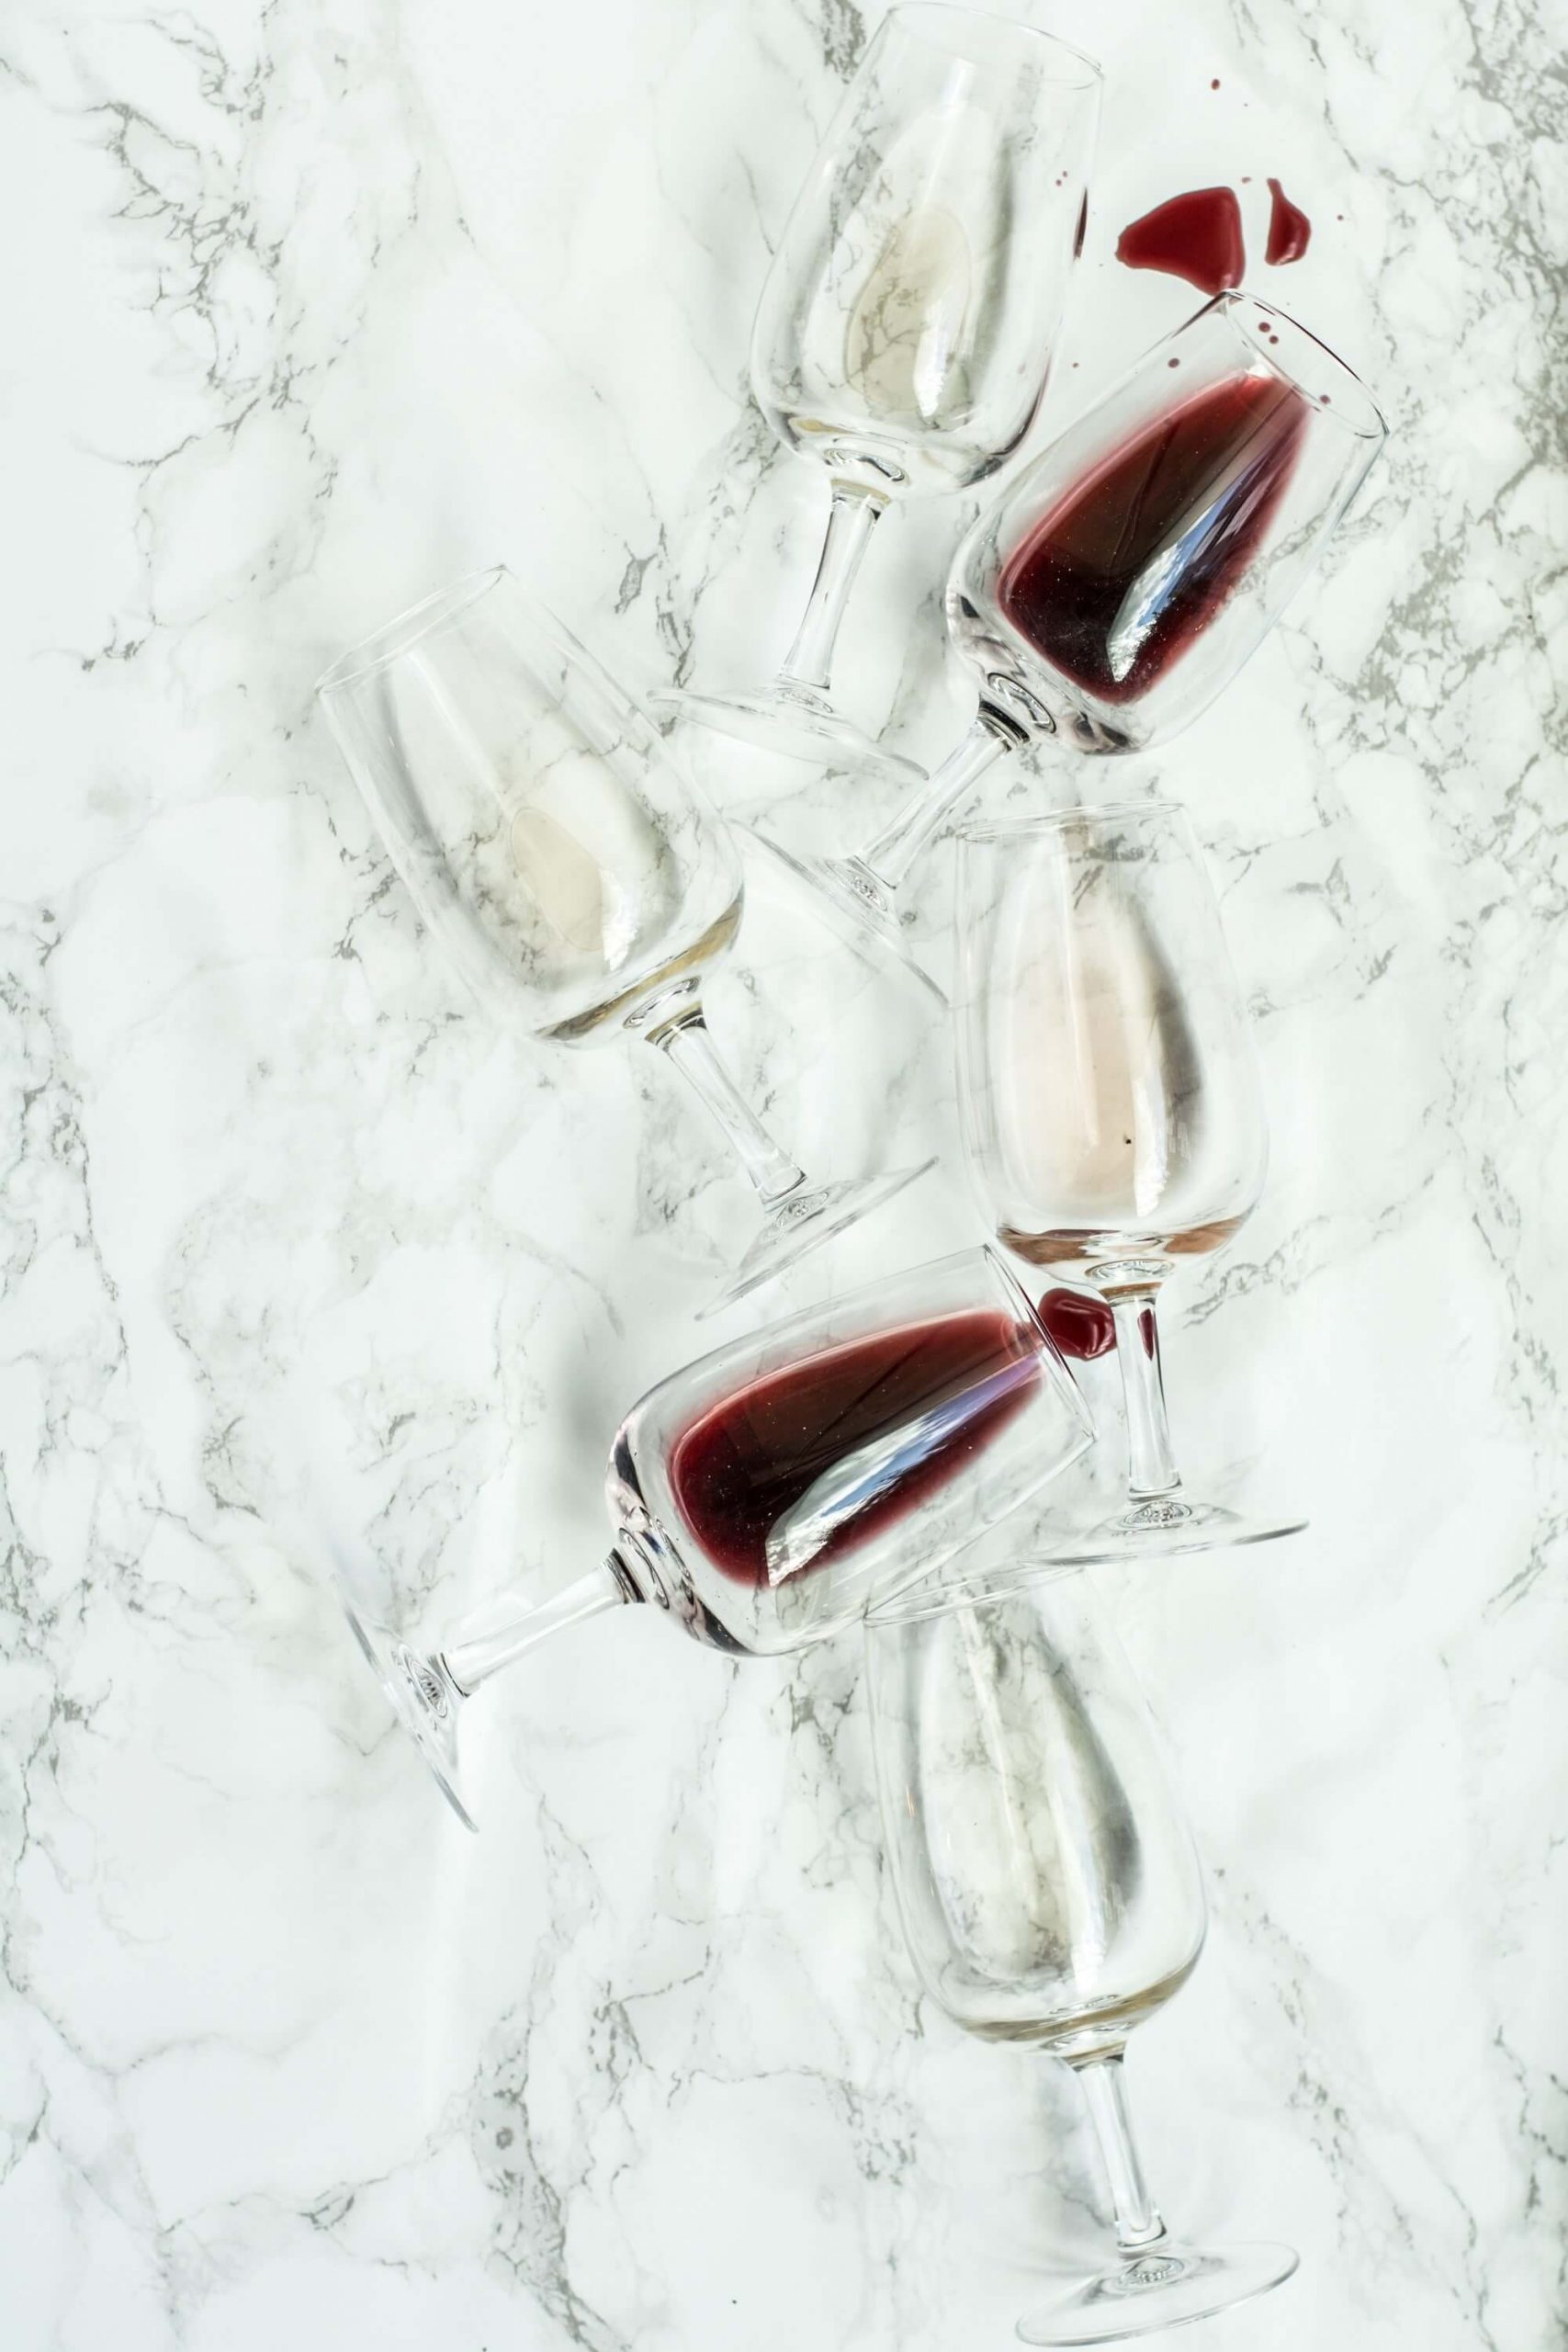 Nye viner i novemberslippet